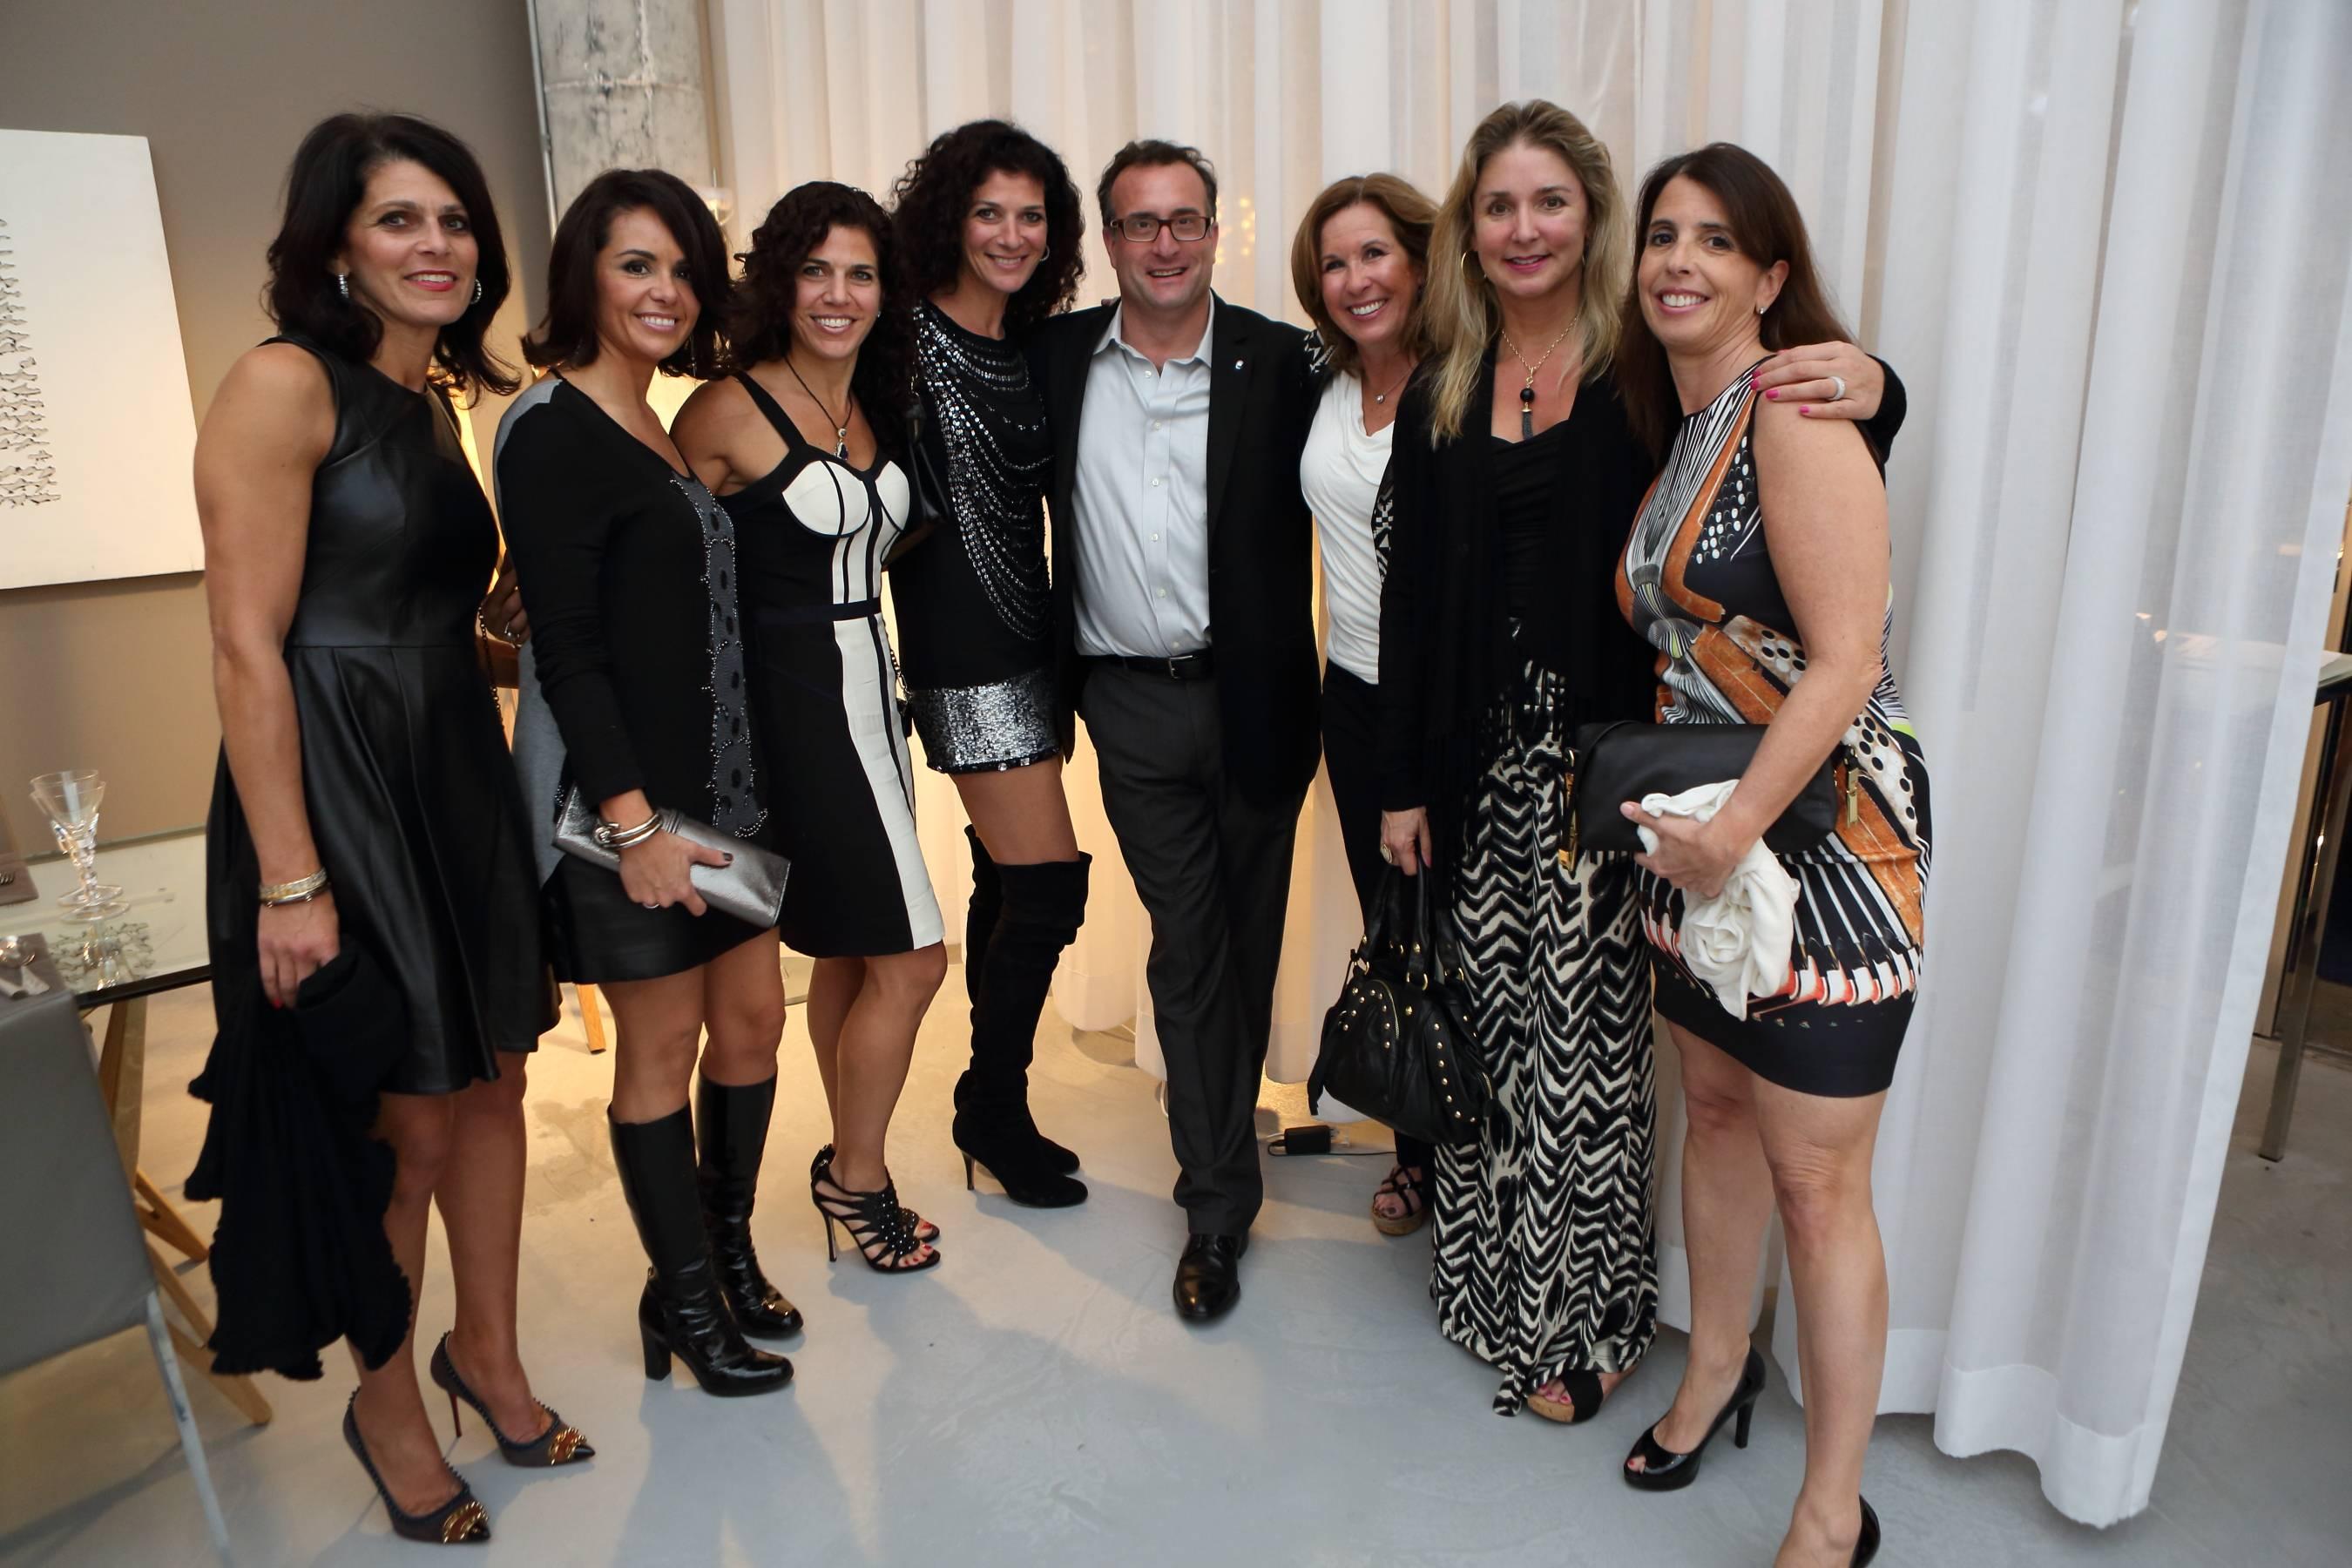 Angela Class, Maria Fava, Michelle Fava, Vanessa Fava, Patty Rubino, Renee Townsley Ellen Lopresti, Jeffrey Ehoodin